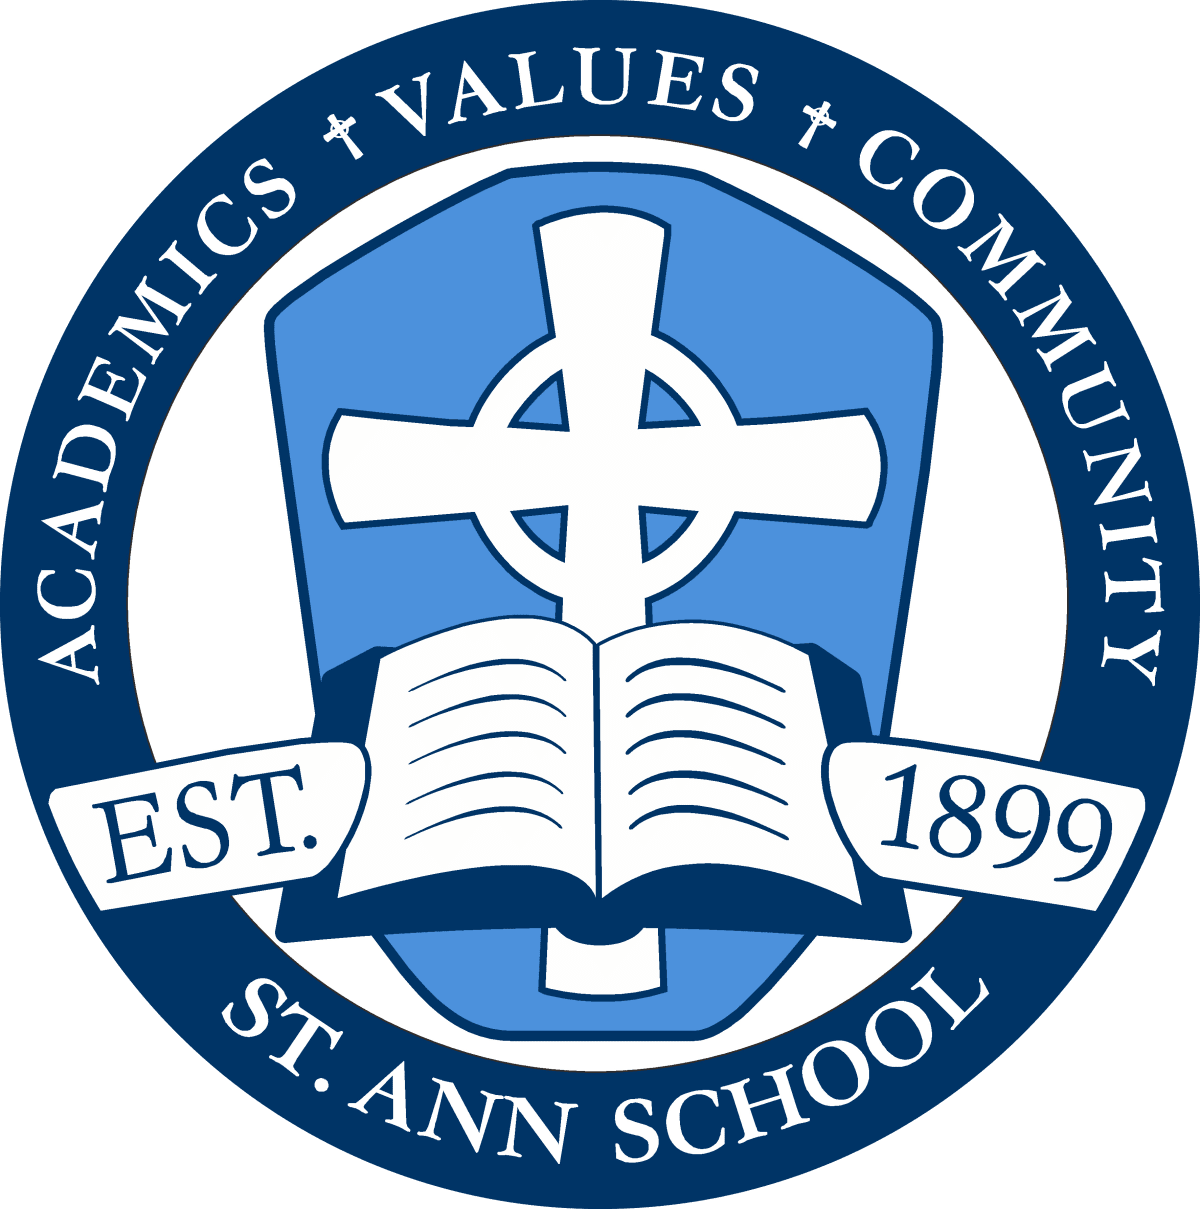 St. Ann School - Logo